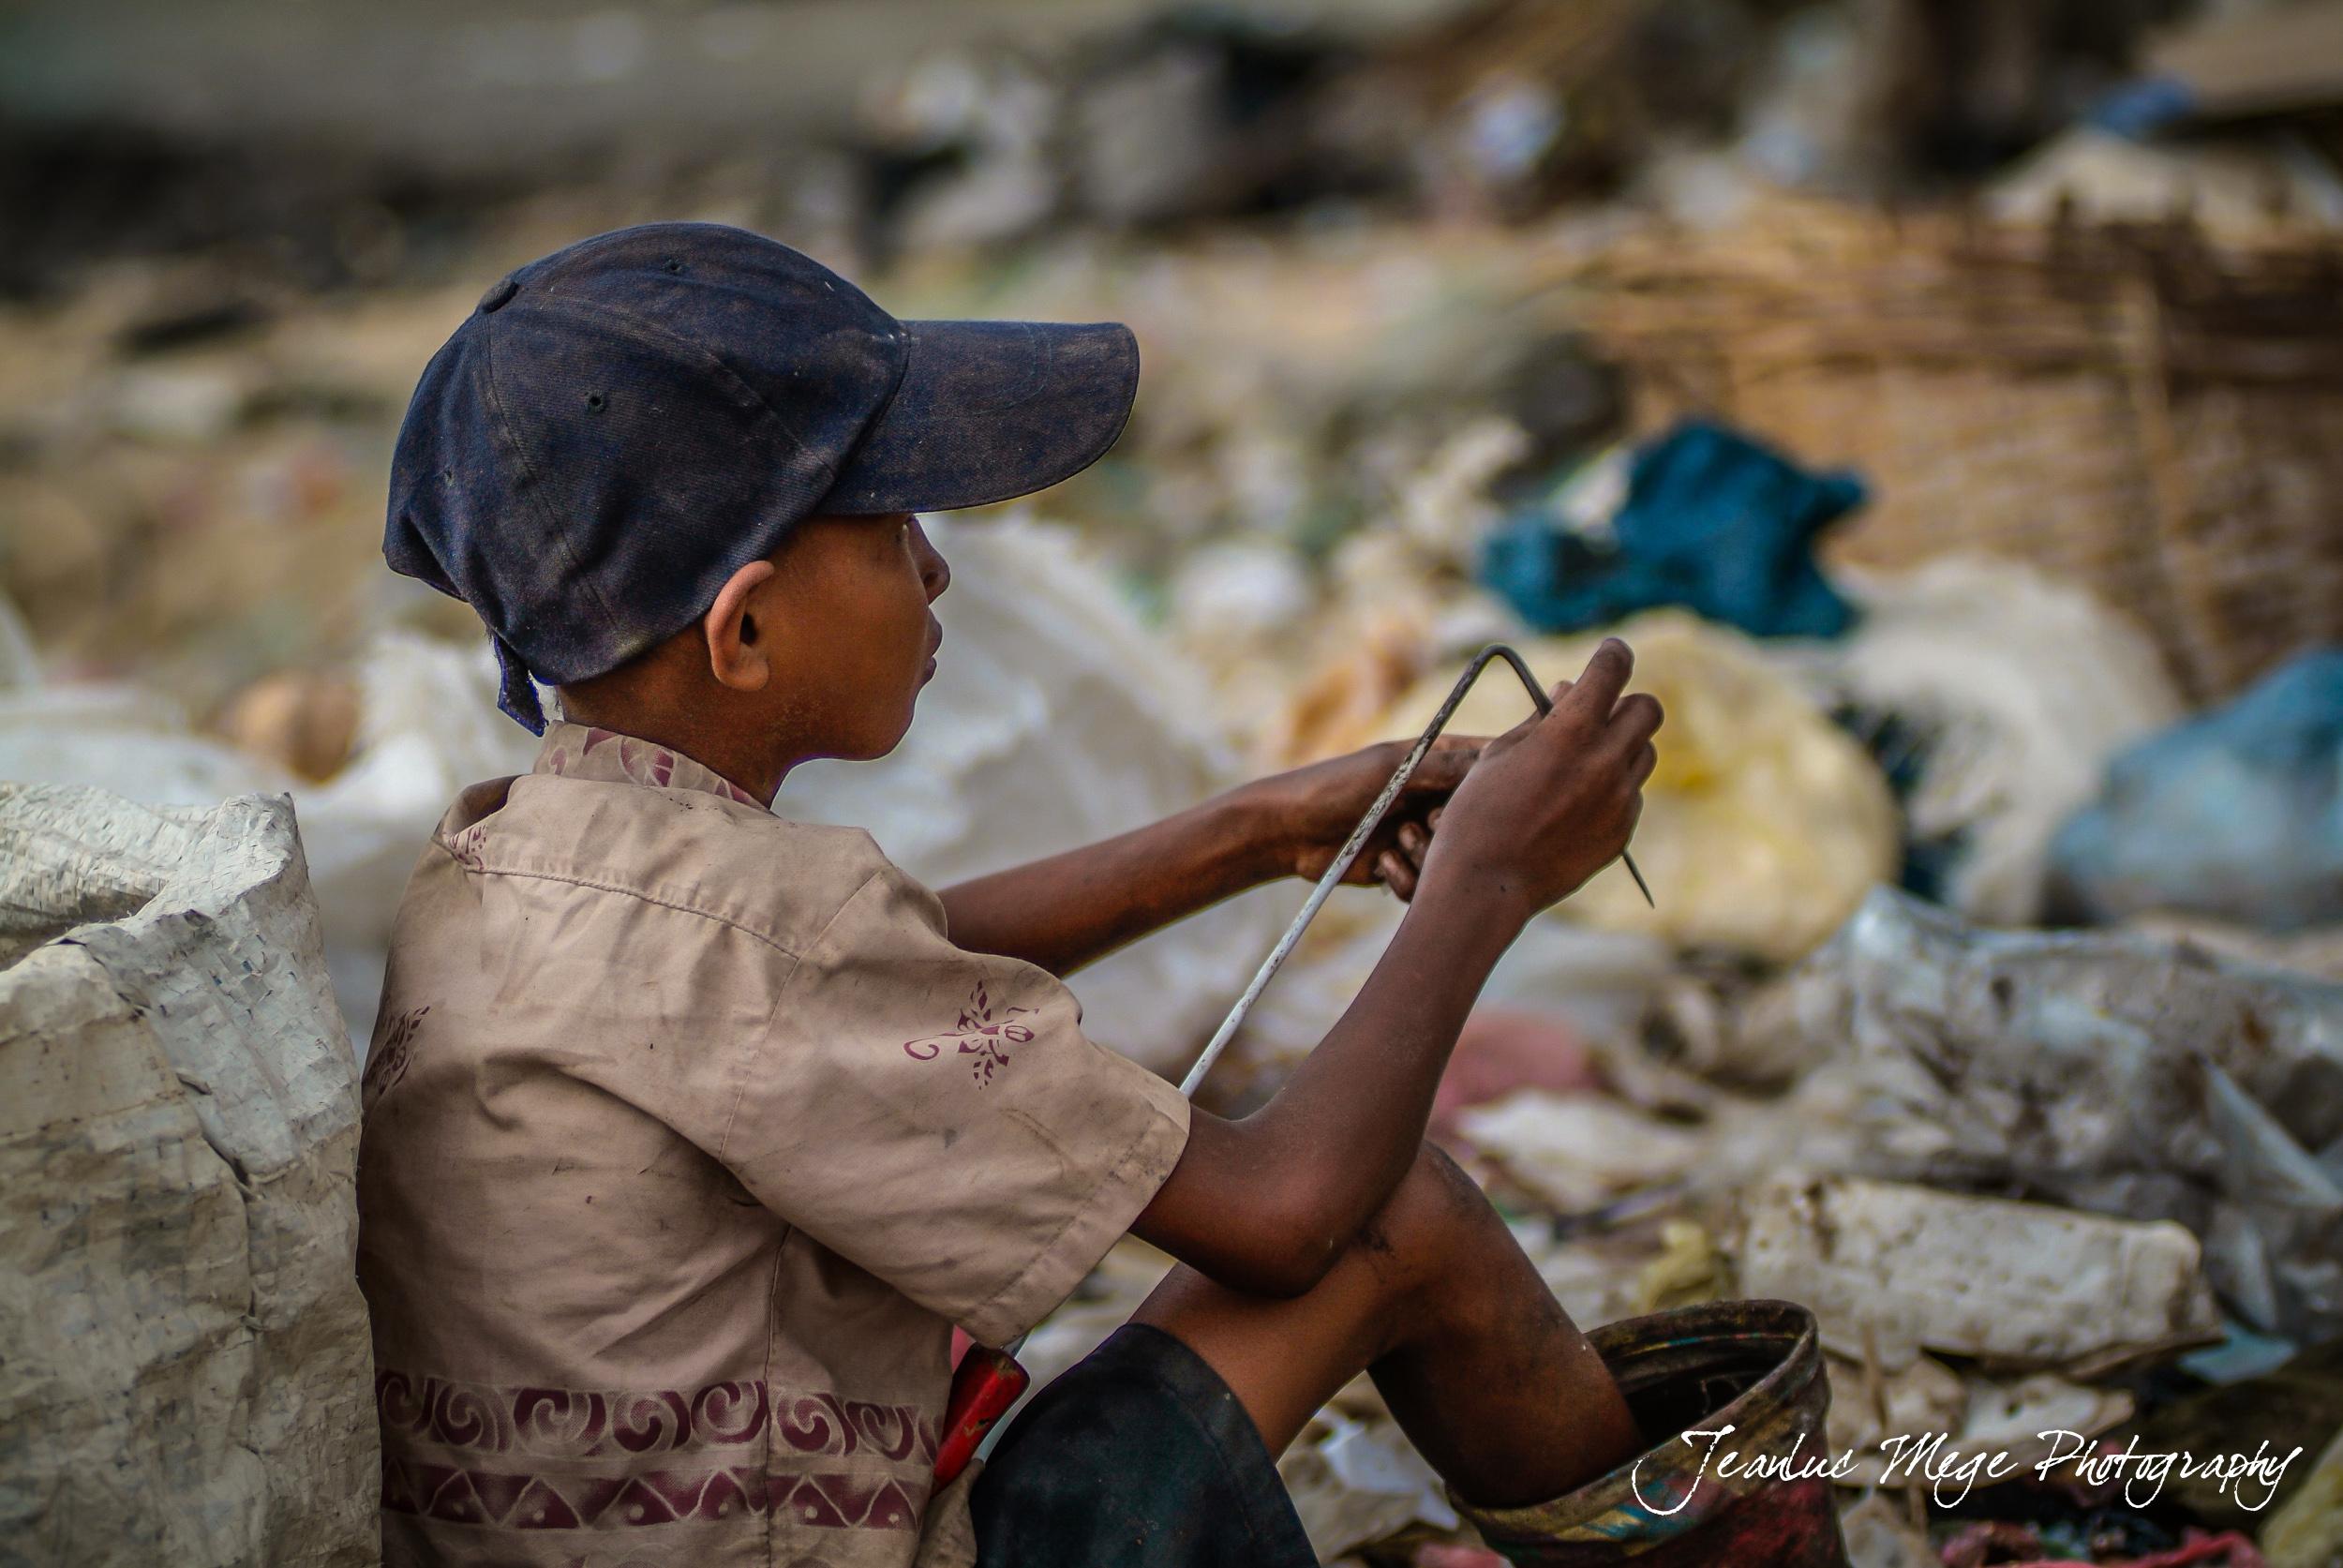 Jean Luc Mege Cambodia-8793.jpg